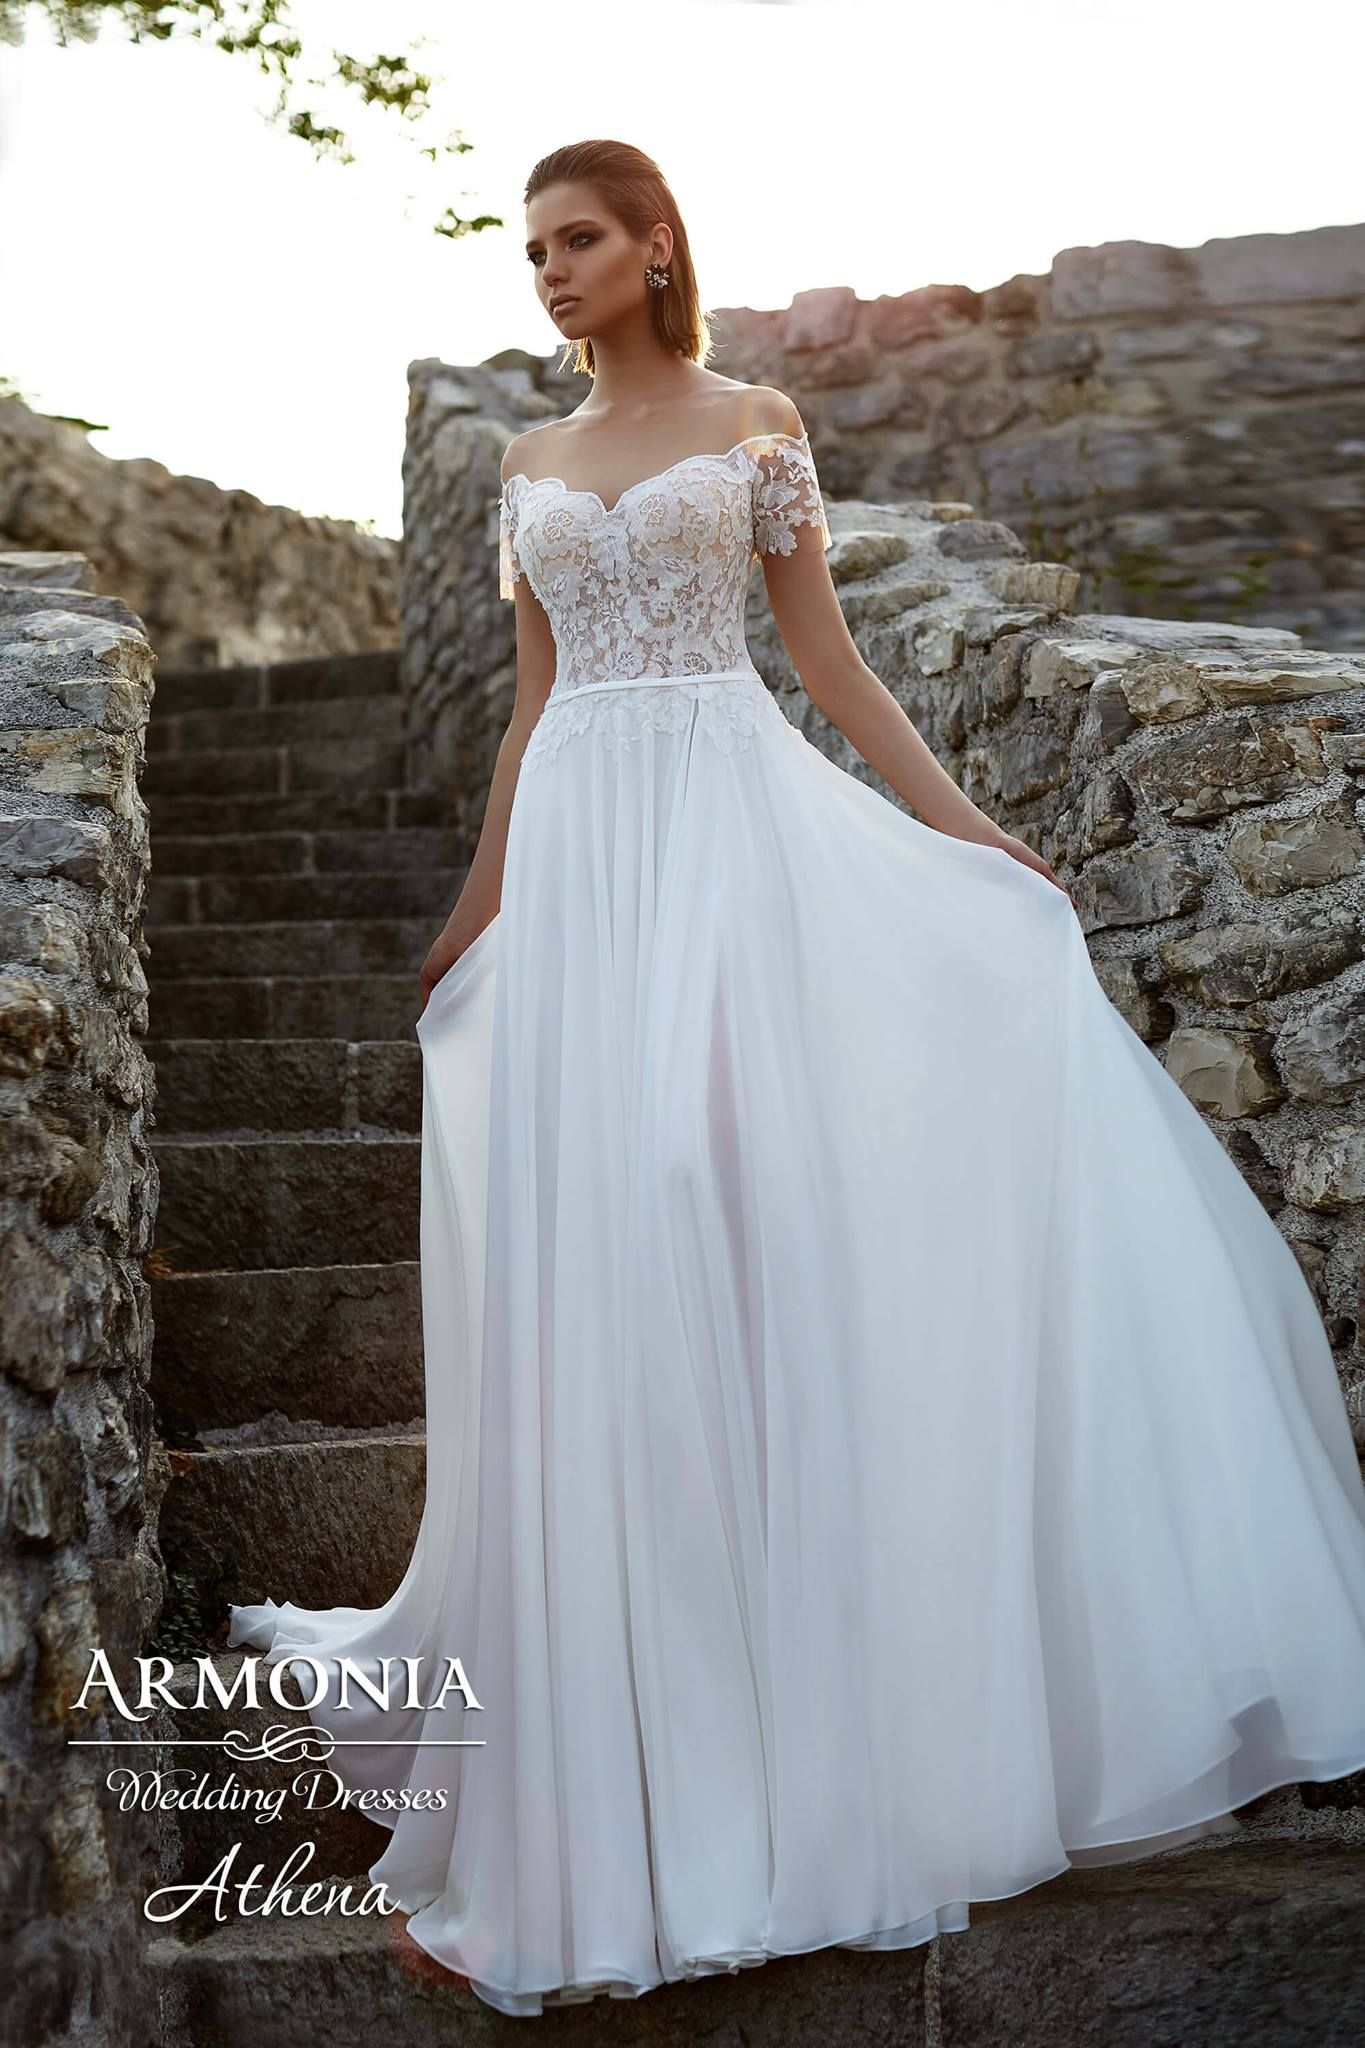 Encantador Vestido De Novia Athena Ideas Ornamento Elaboración ...